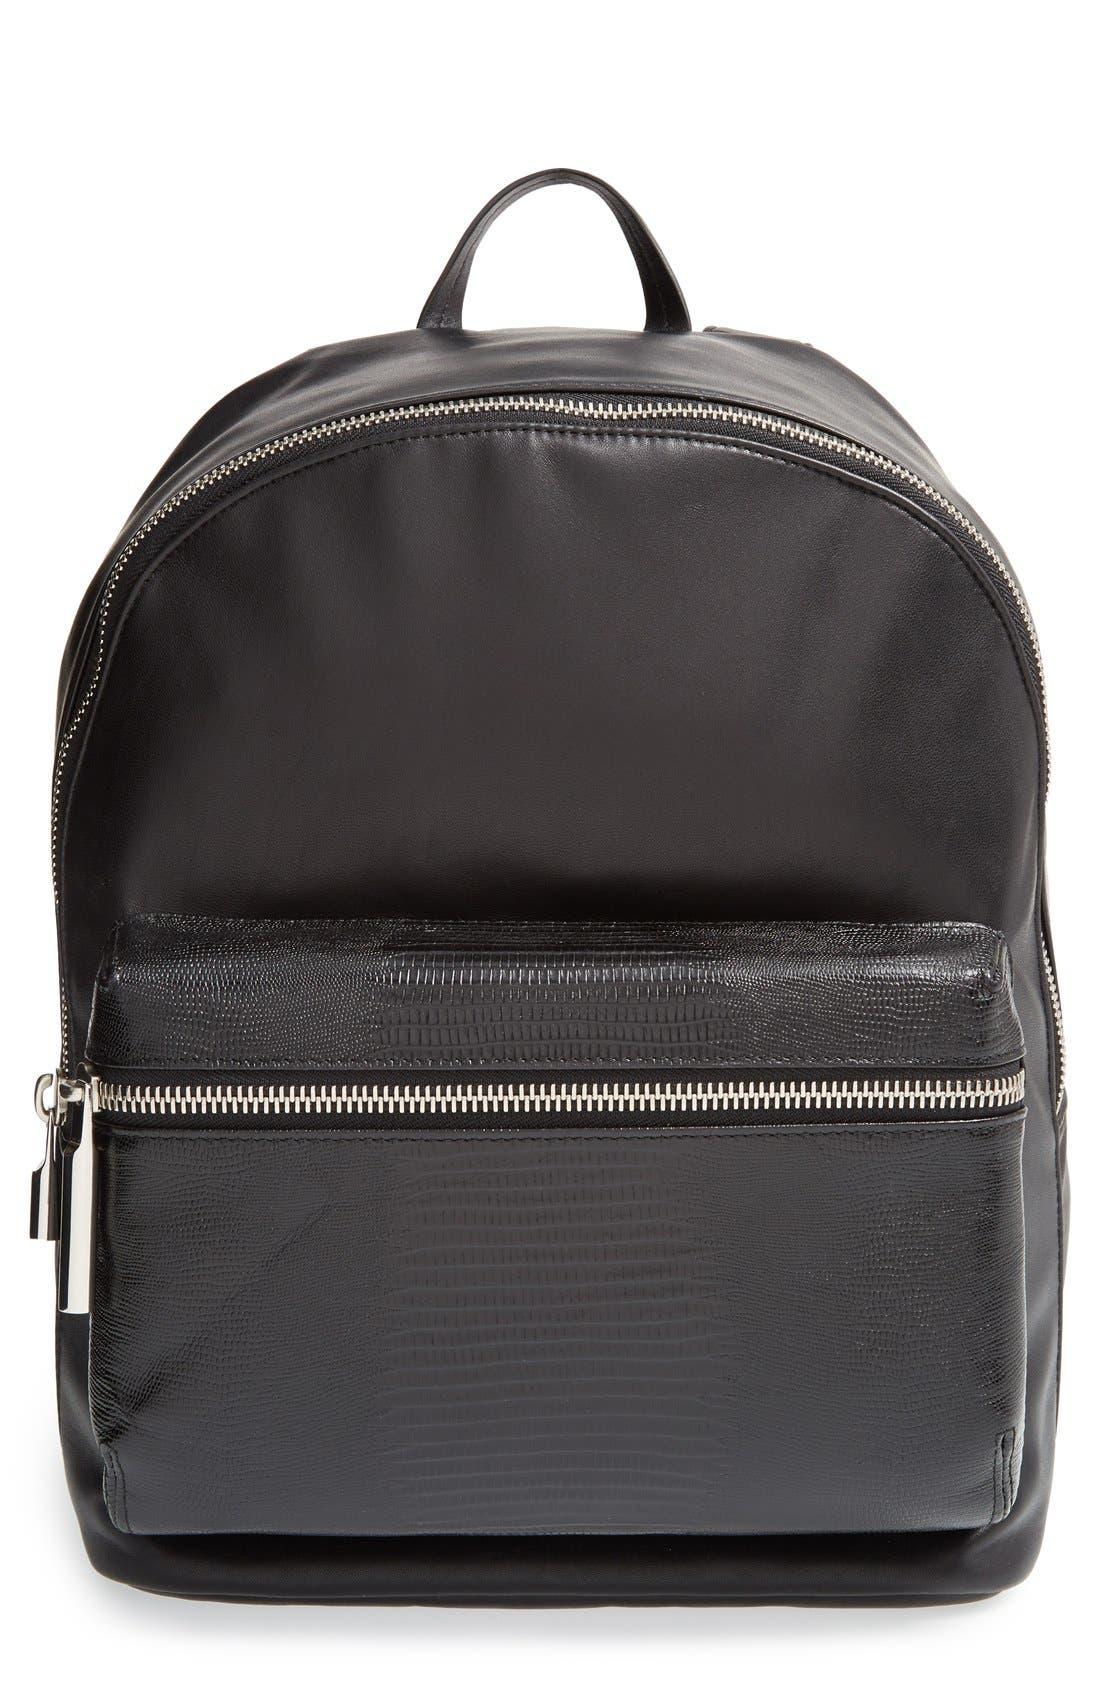 Alternate Image 1 Selected - Elizabeth and James 'Cynnie' Lizard Embossed Leather Backpack